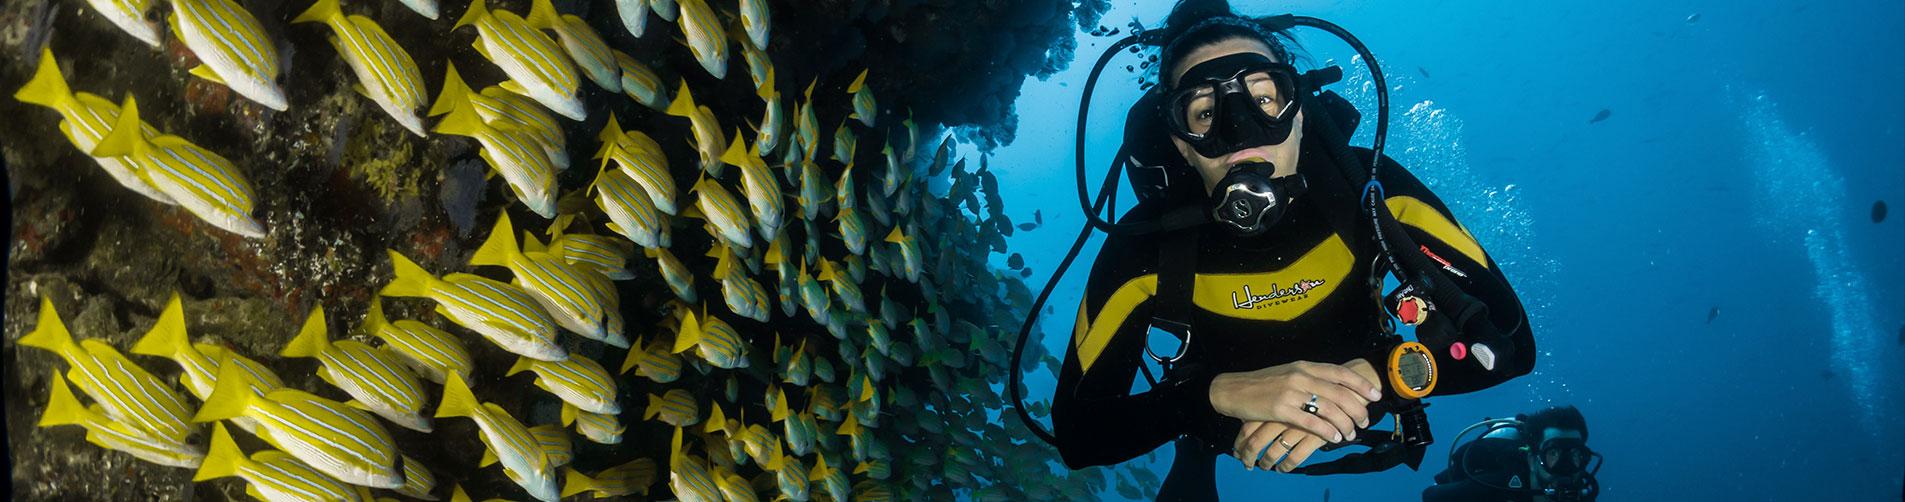 Scuba diving - slide